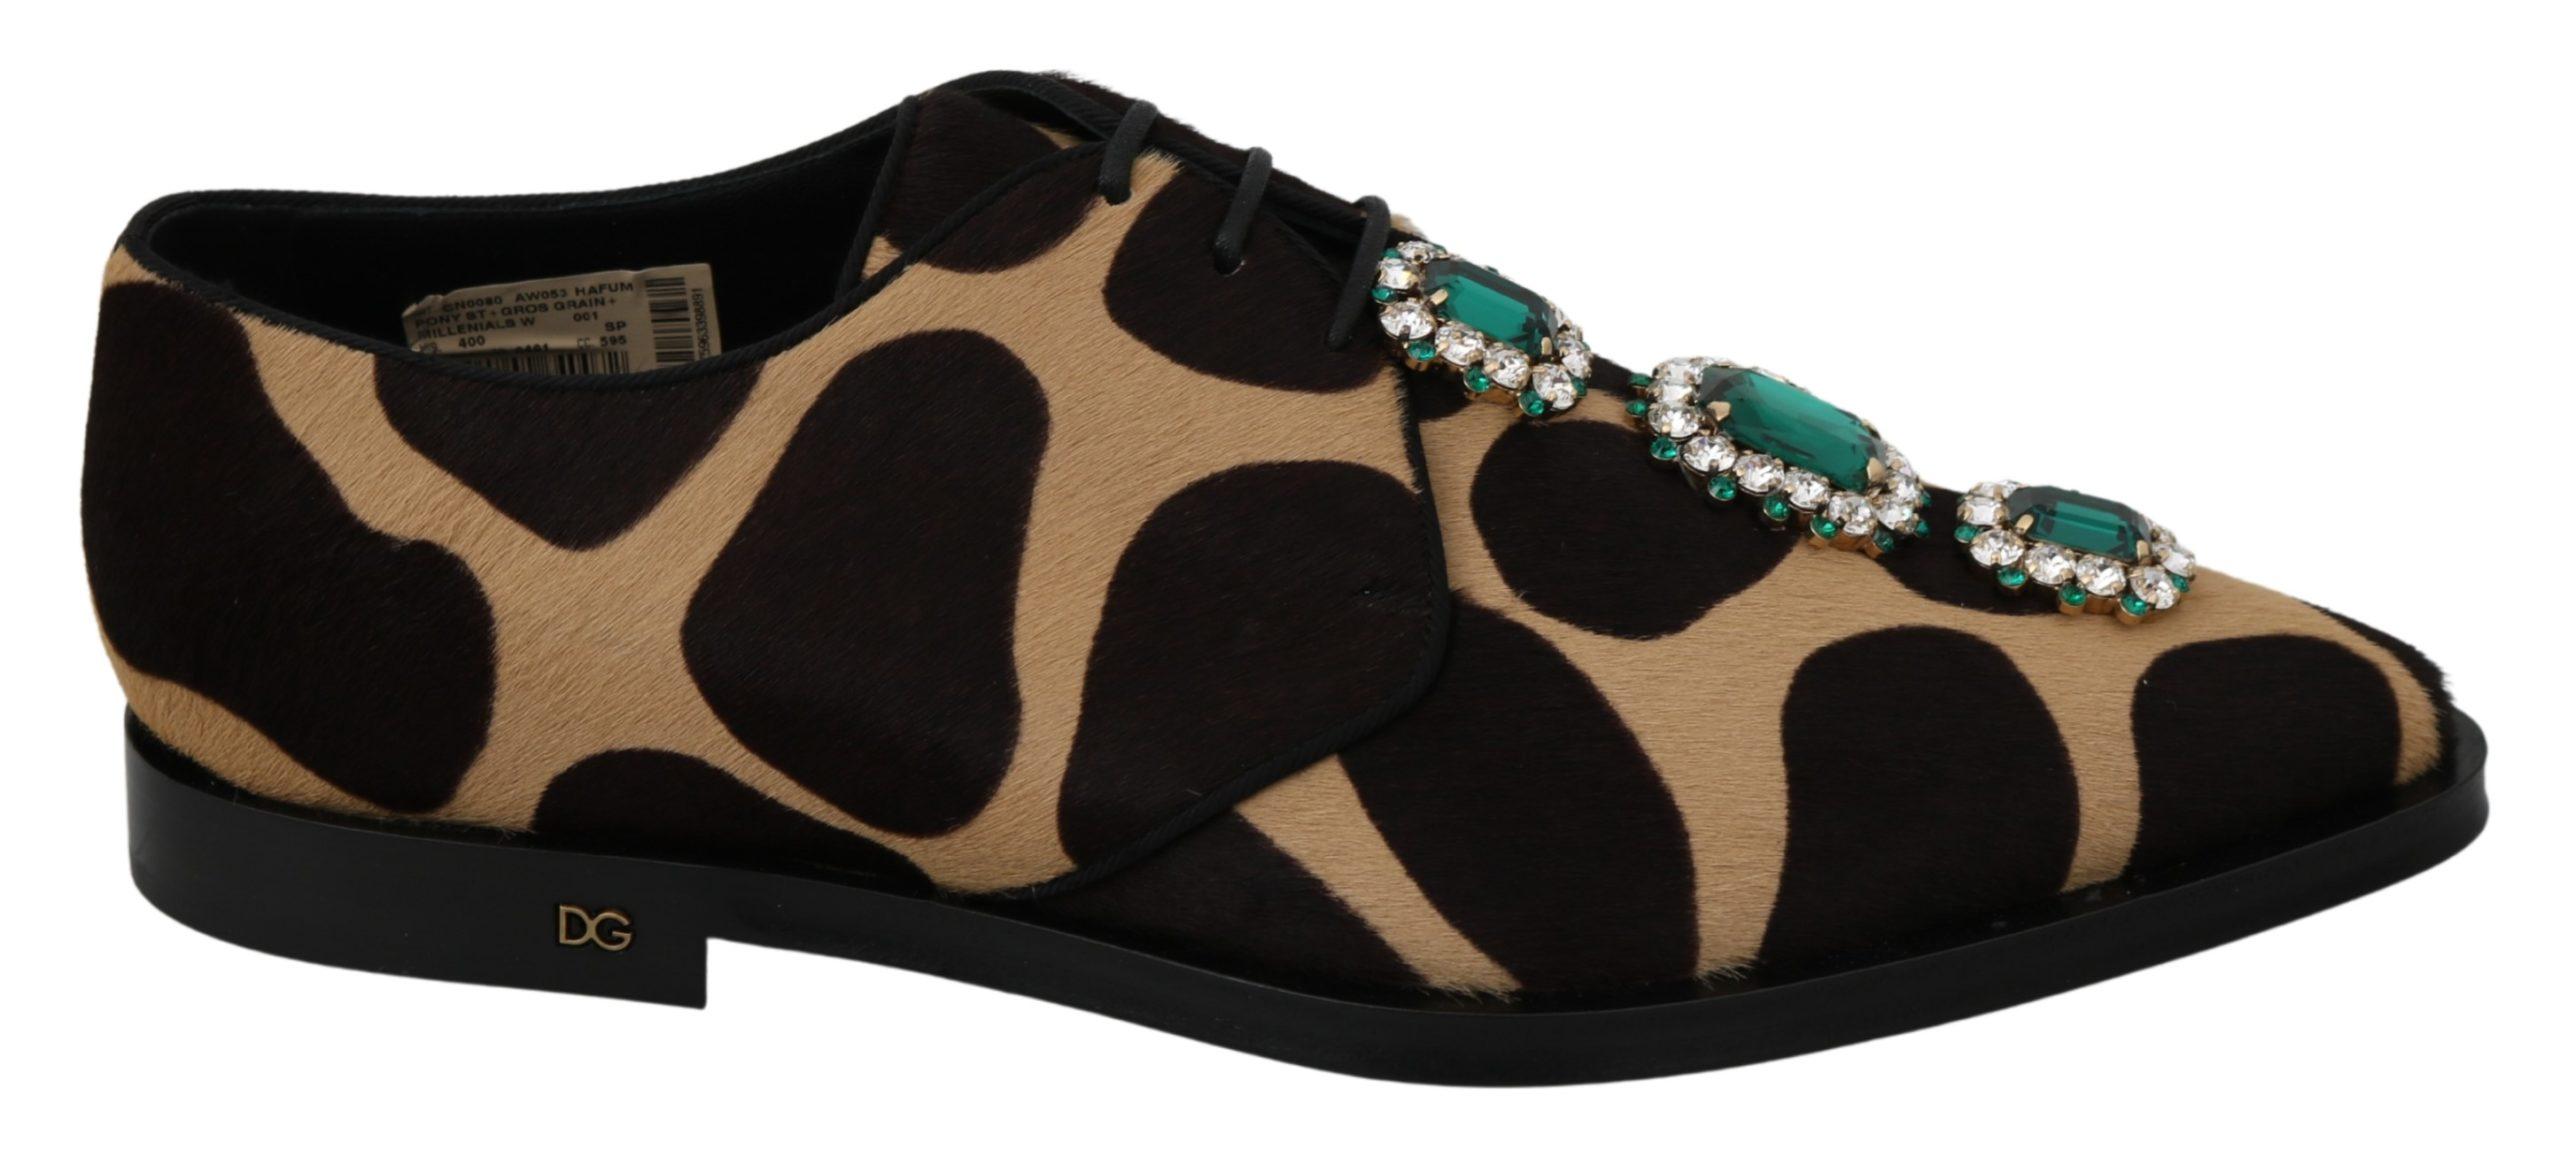 Dolce & Gabbana Women's Pony Hair Crystal Dress Broque Shoe Brown LA7216 - EU40/US9.5